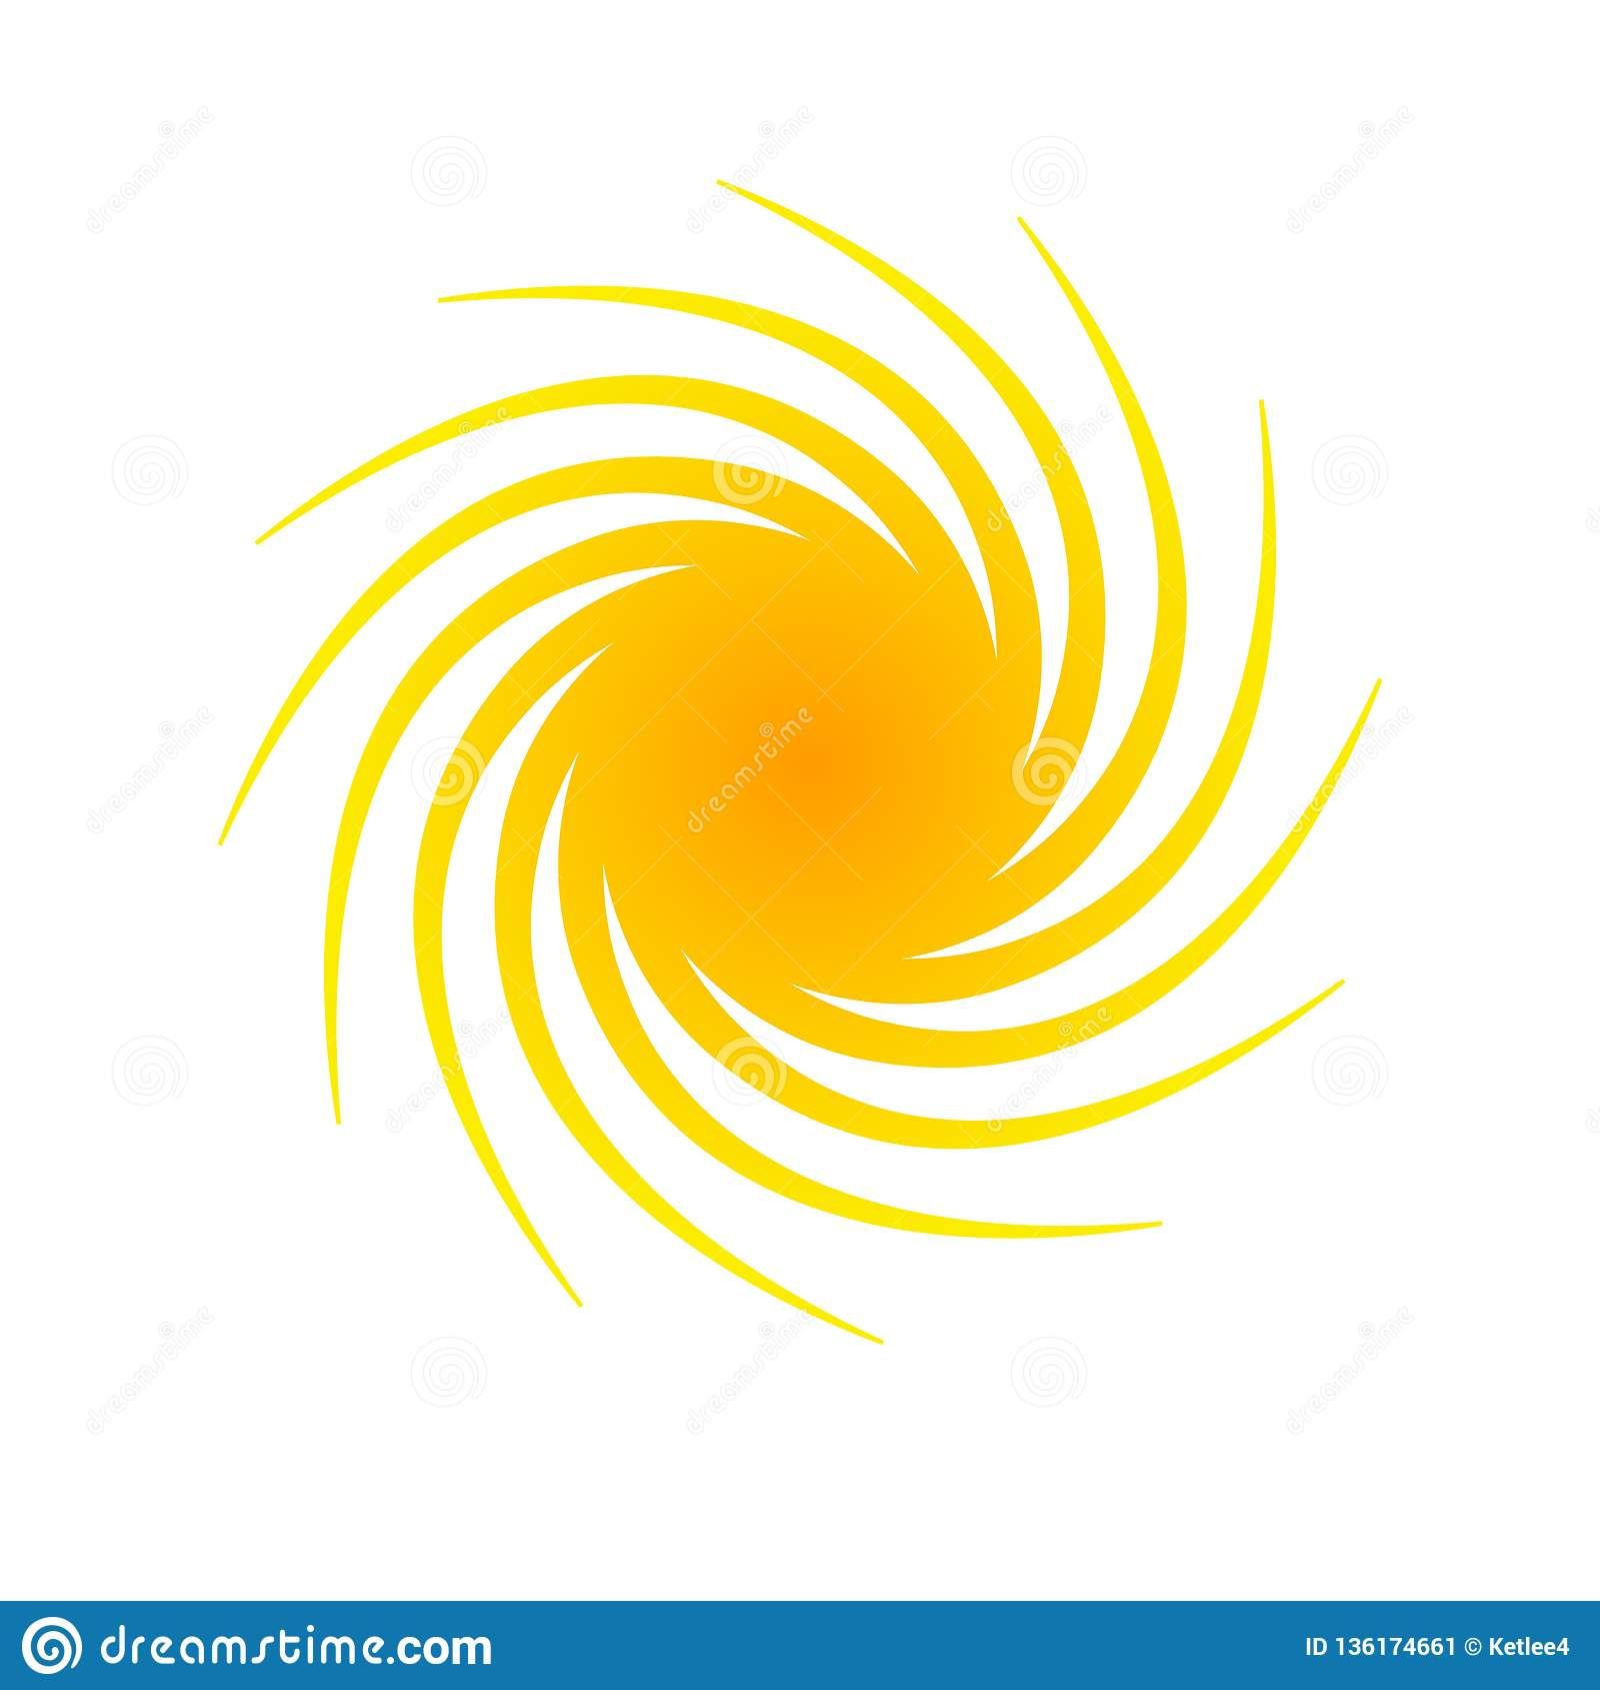 Elemento abstrato alaranjado da bandeira do círculo para o projeto sob a forma do sol com símbolo isolado decorativo de intervalo